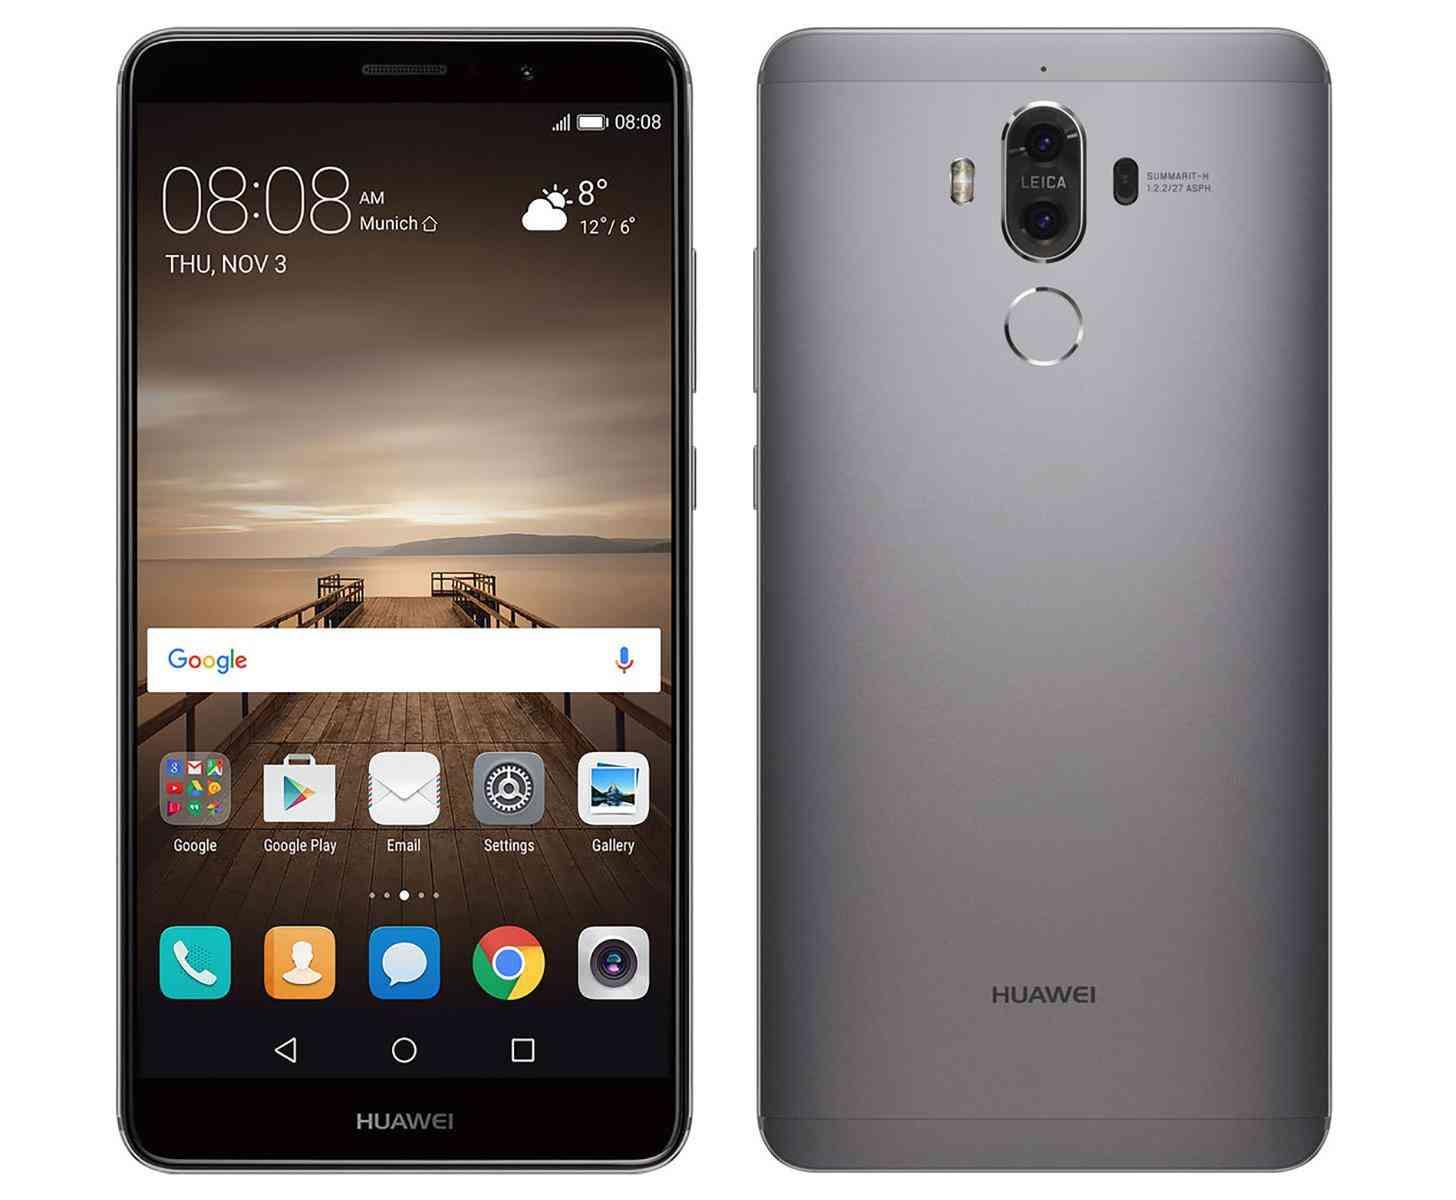 Huawei Mate 9 Space Gray